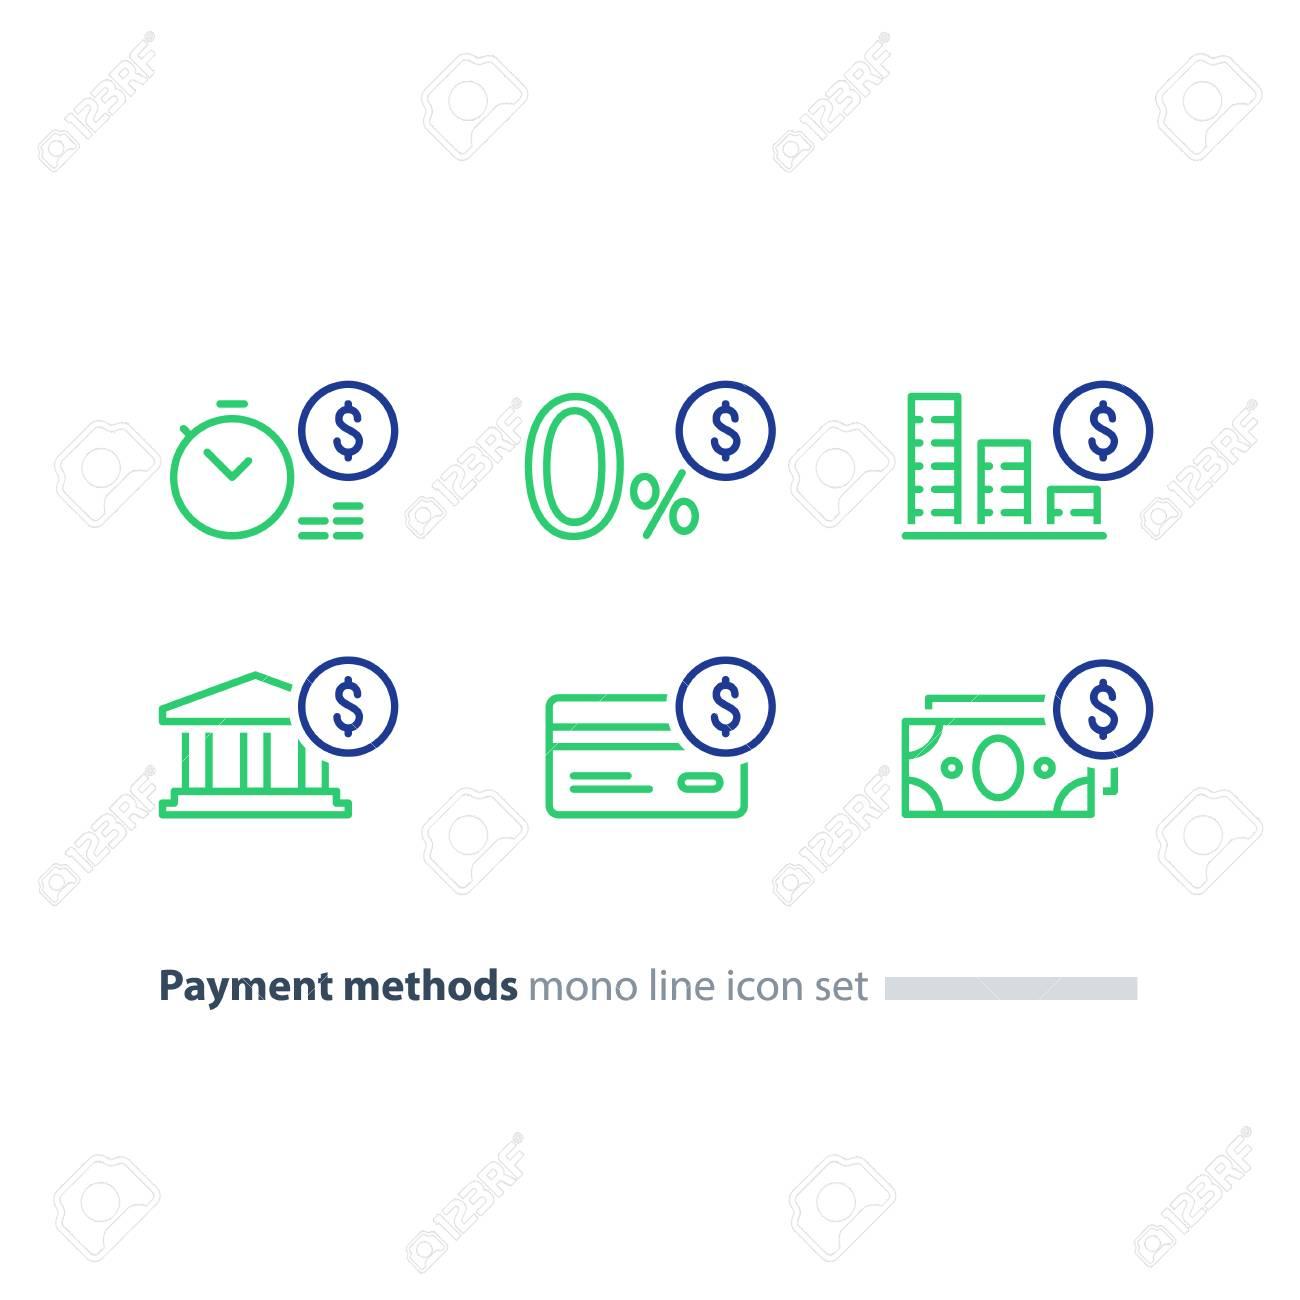 Payment methods, financial items set, zero percent commission fee, credit card money transaction. - 79256210